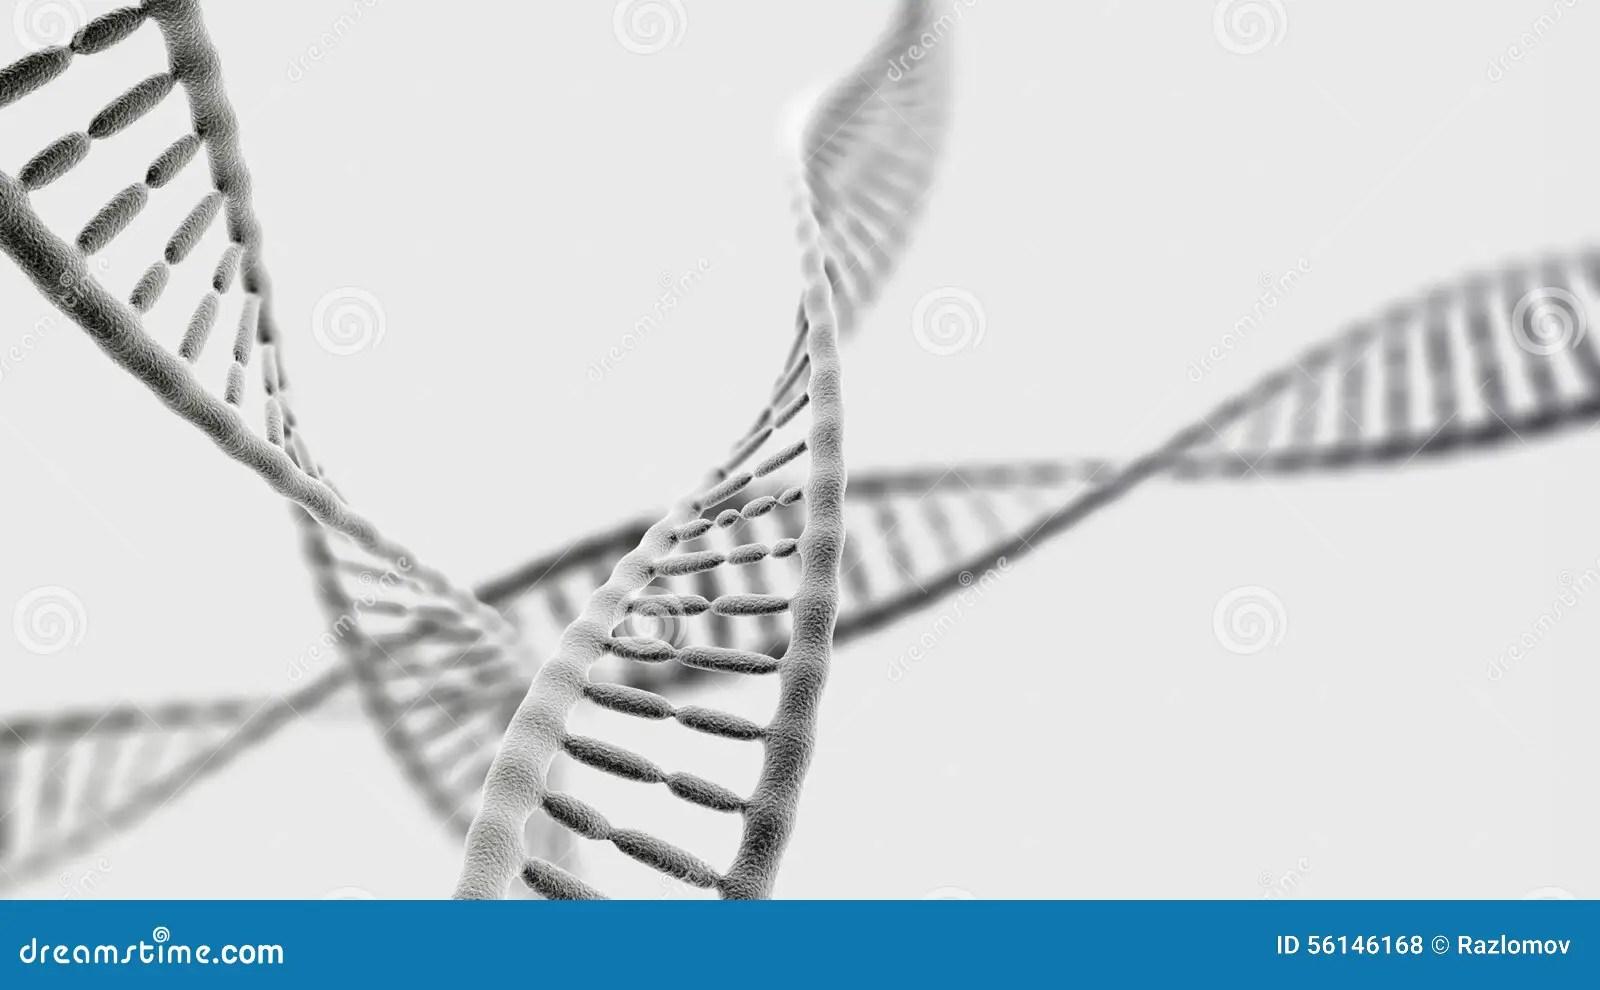 human dna helix